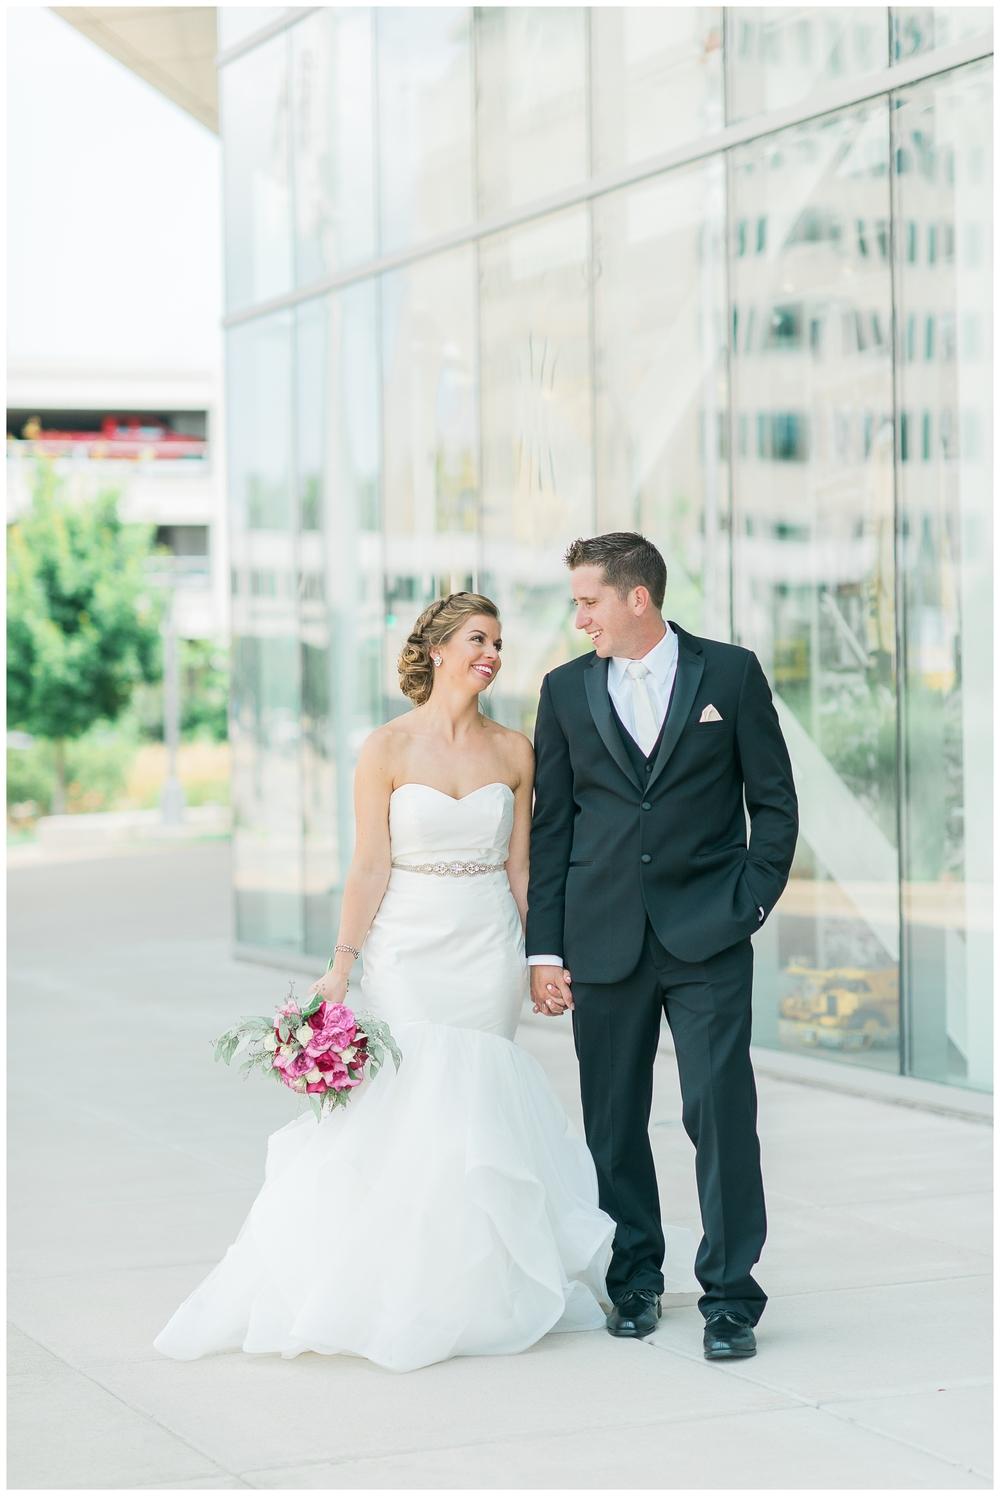 Rebecca_Bridges_Photography_Indianapolis_Wedding_Photographer_5026.jpg